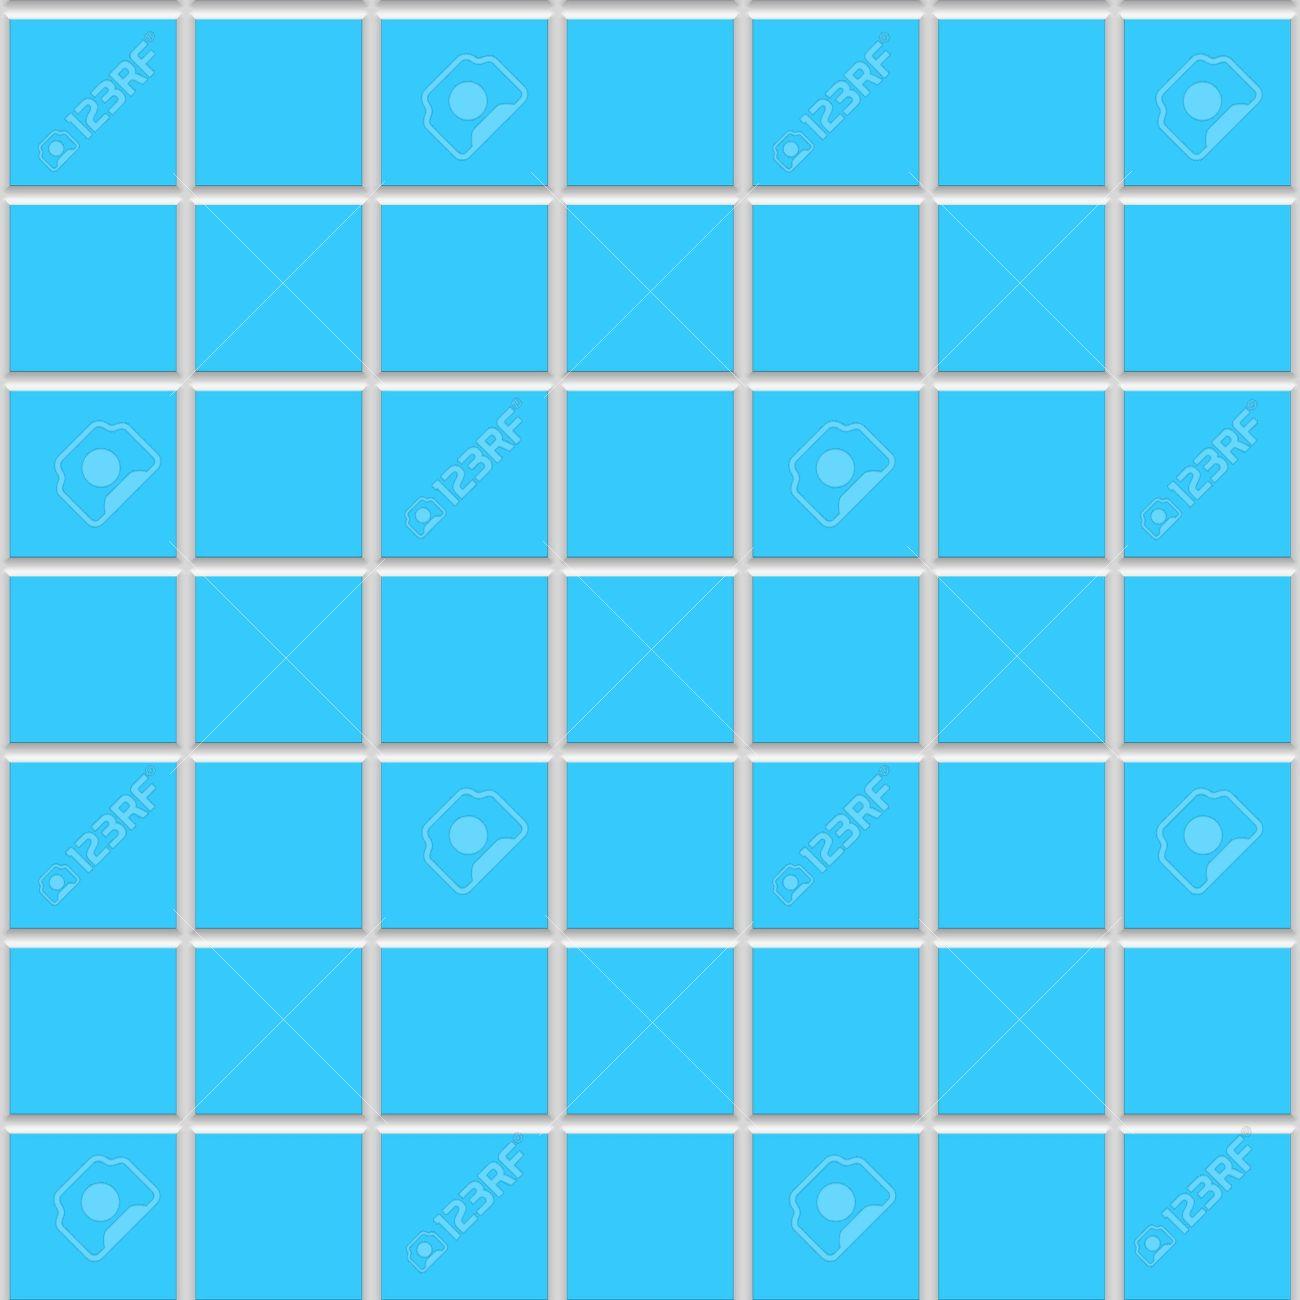 Blue Square Seamless Ceramic Tiles Texture